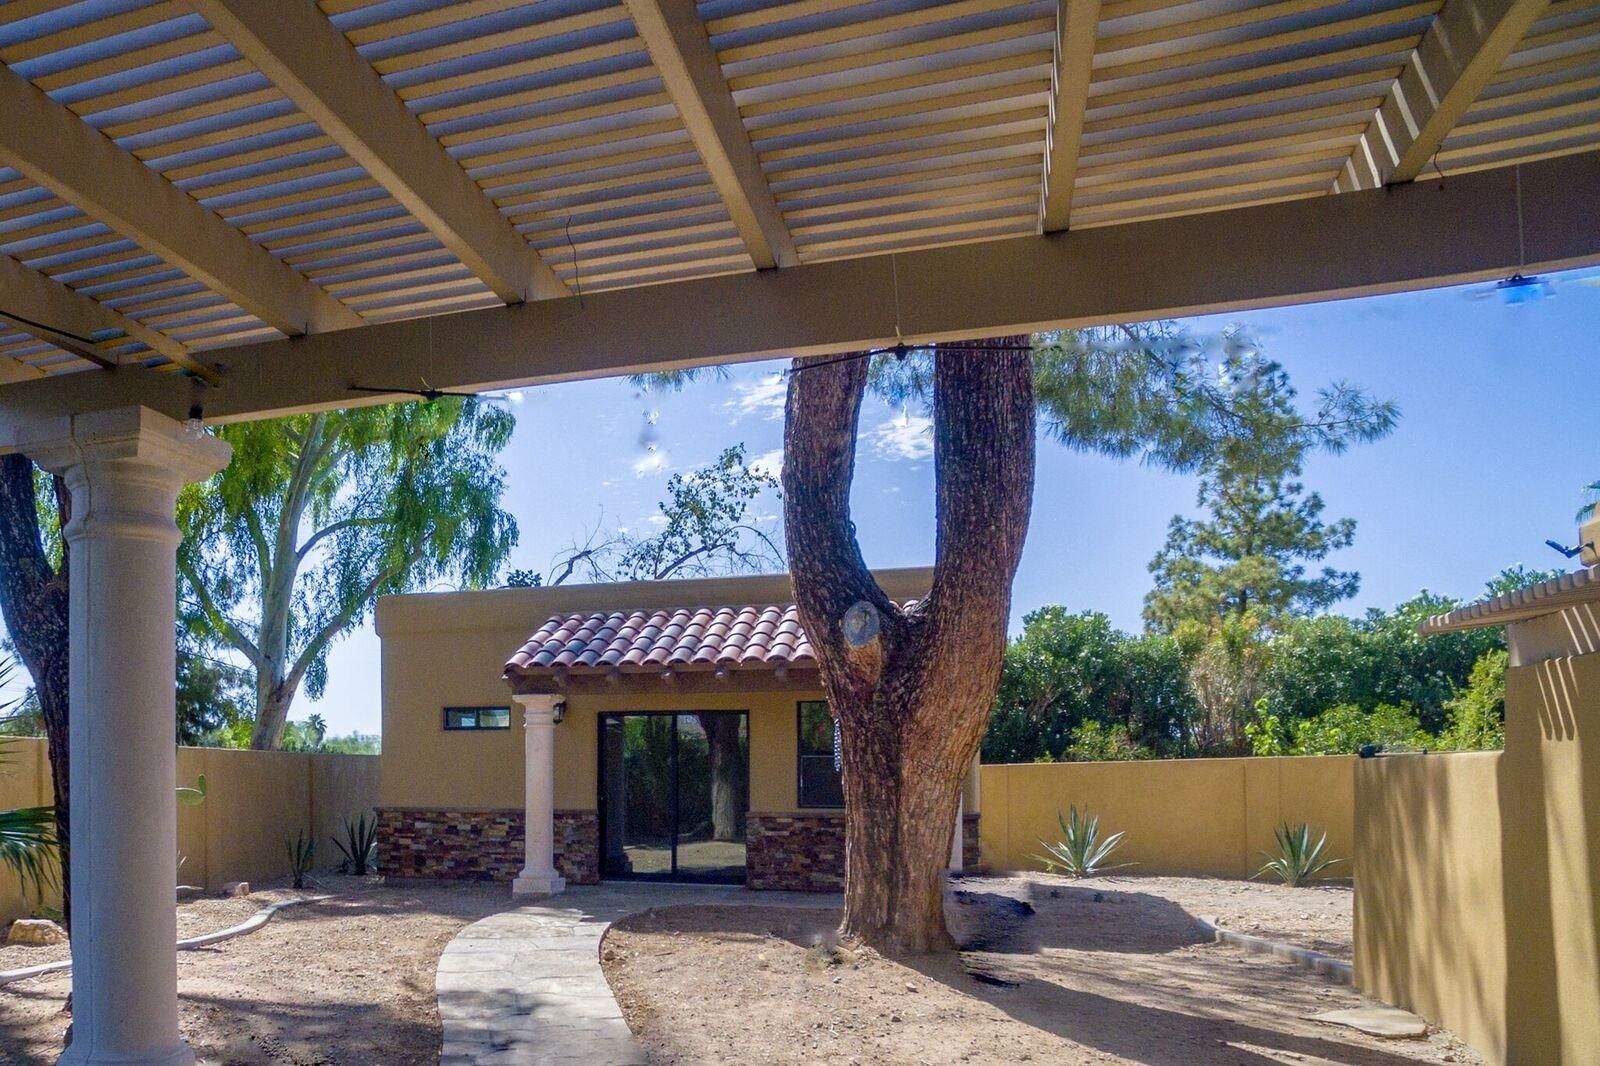 Phoenix Biltmore Casita Guest House 85016